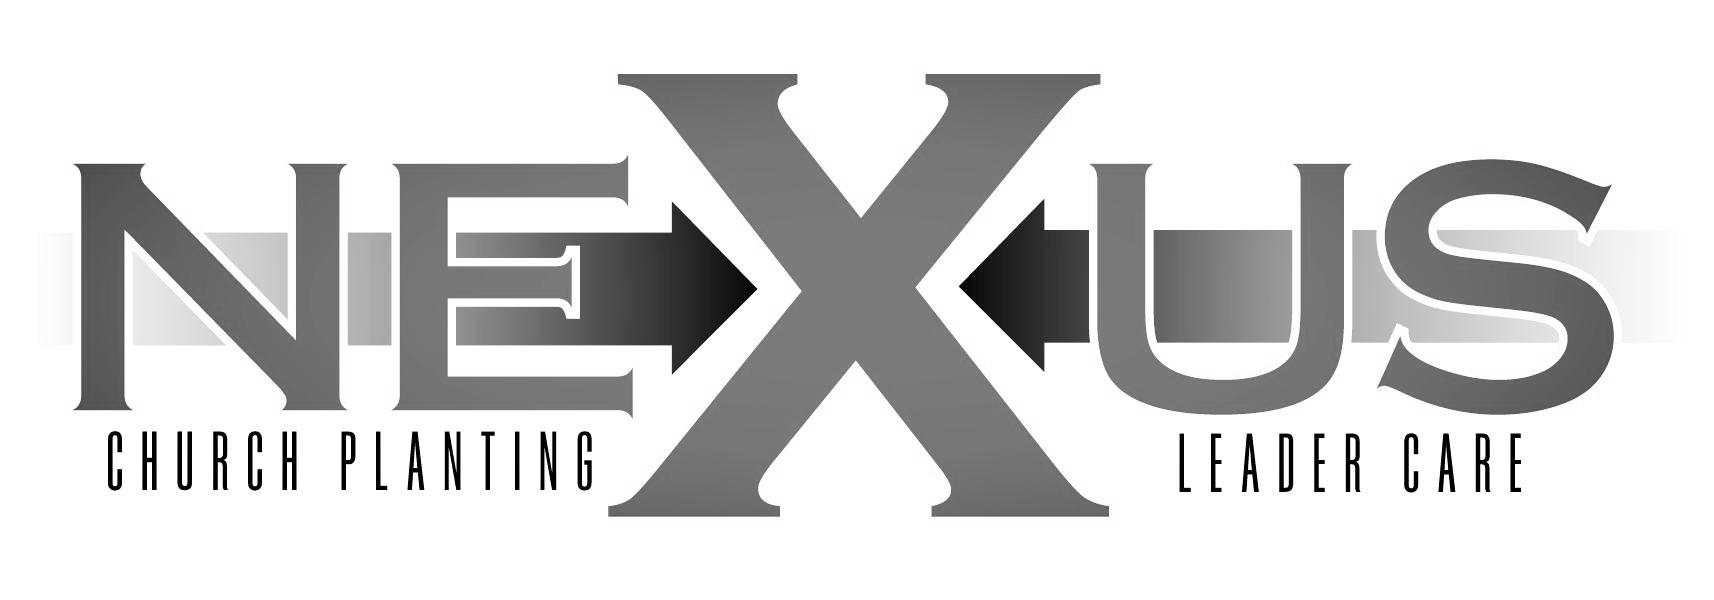 Nexus Church Planting - Revive Christian Church